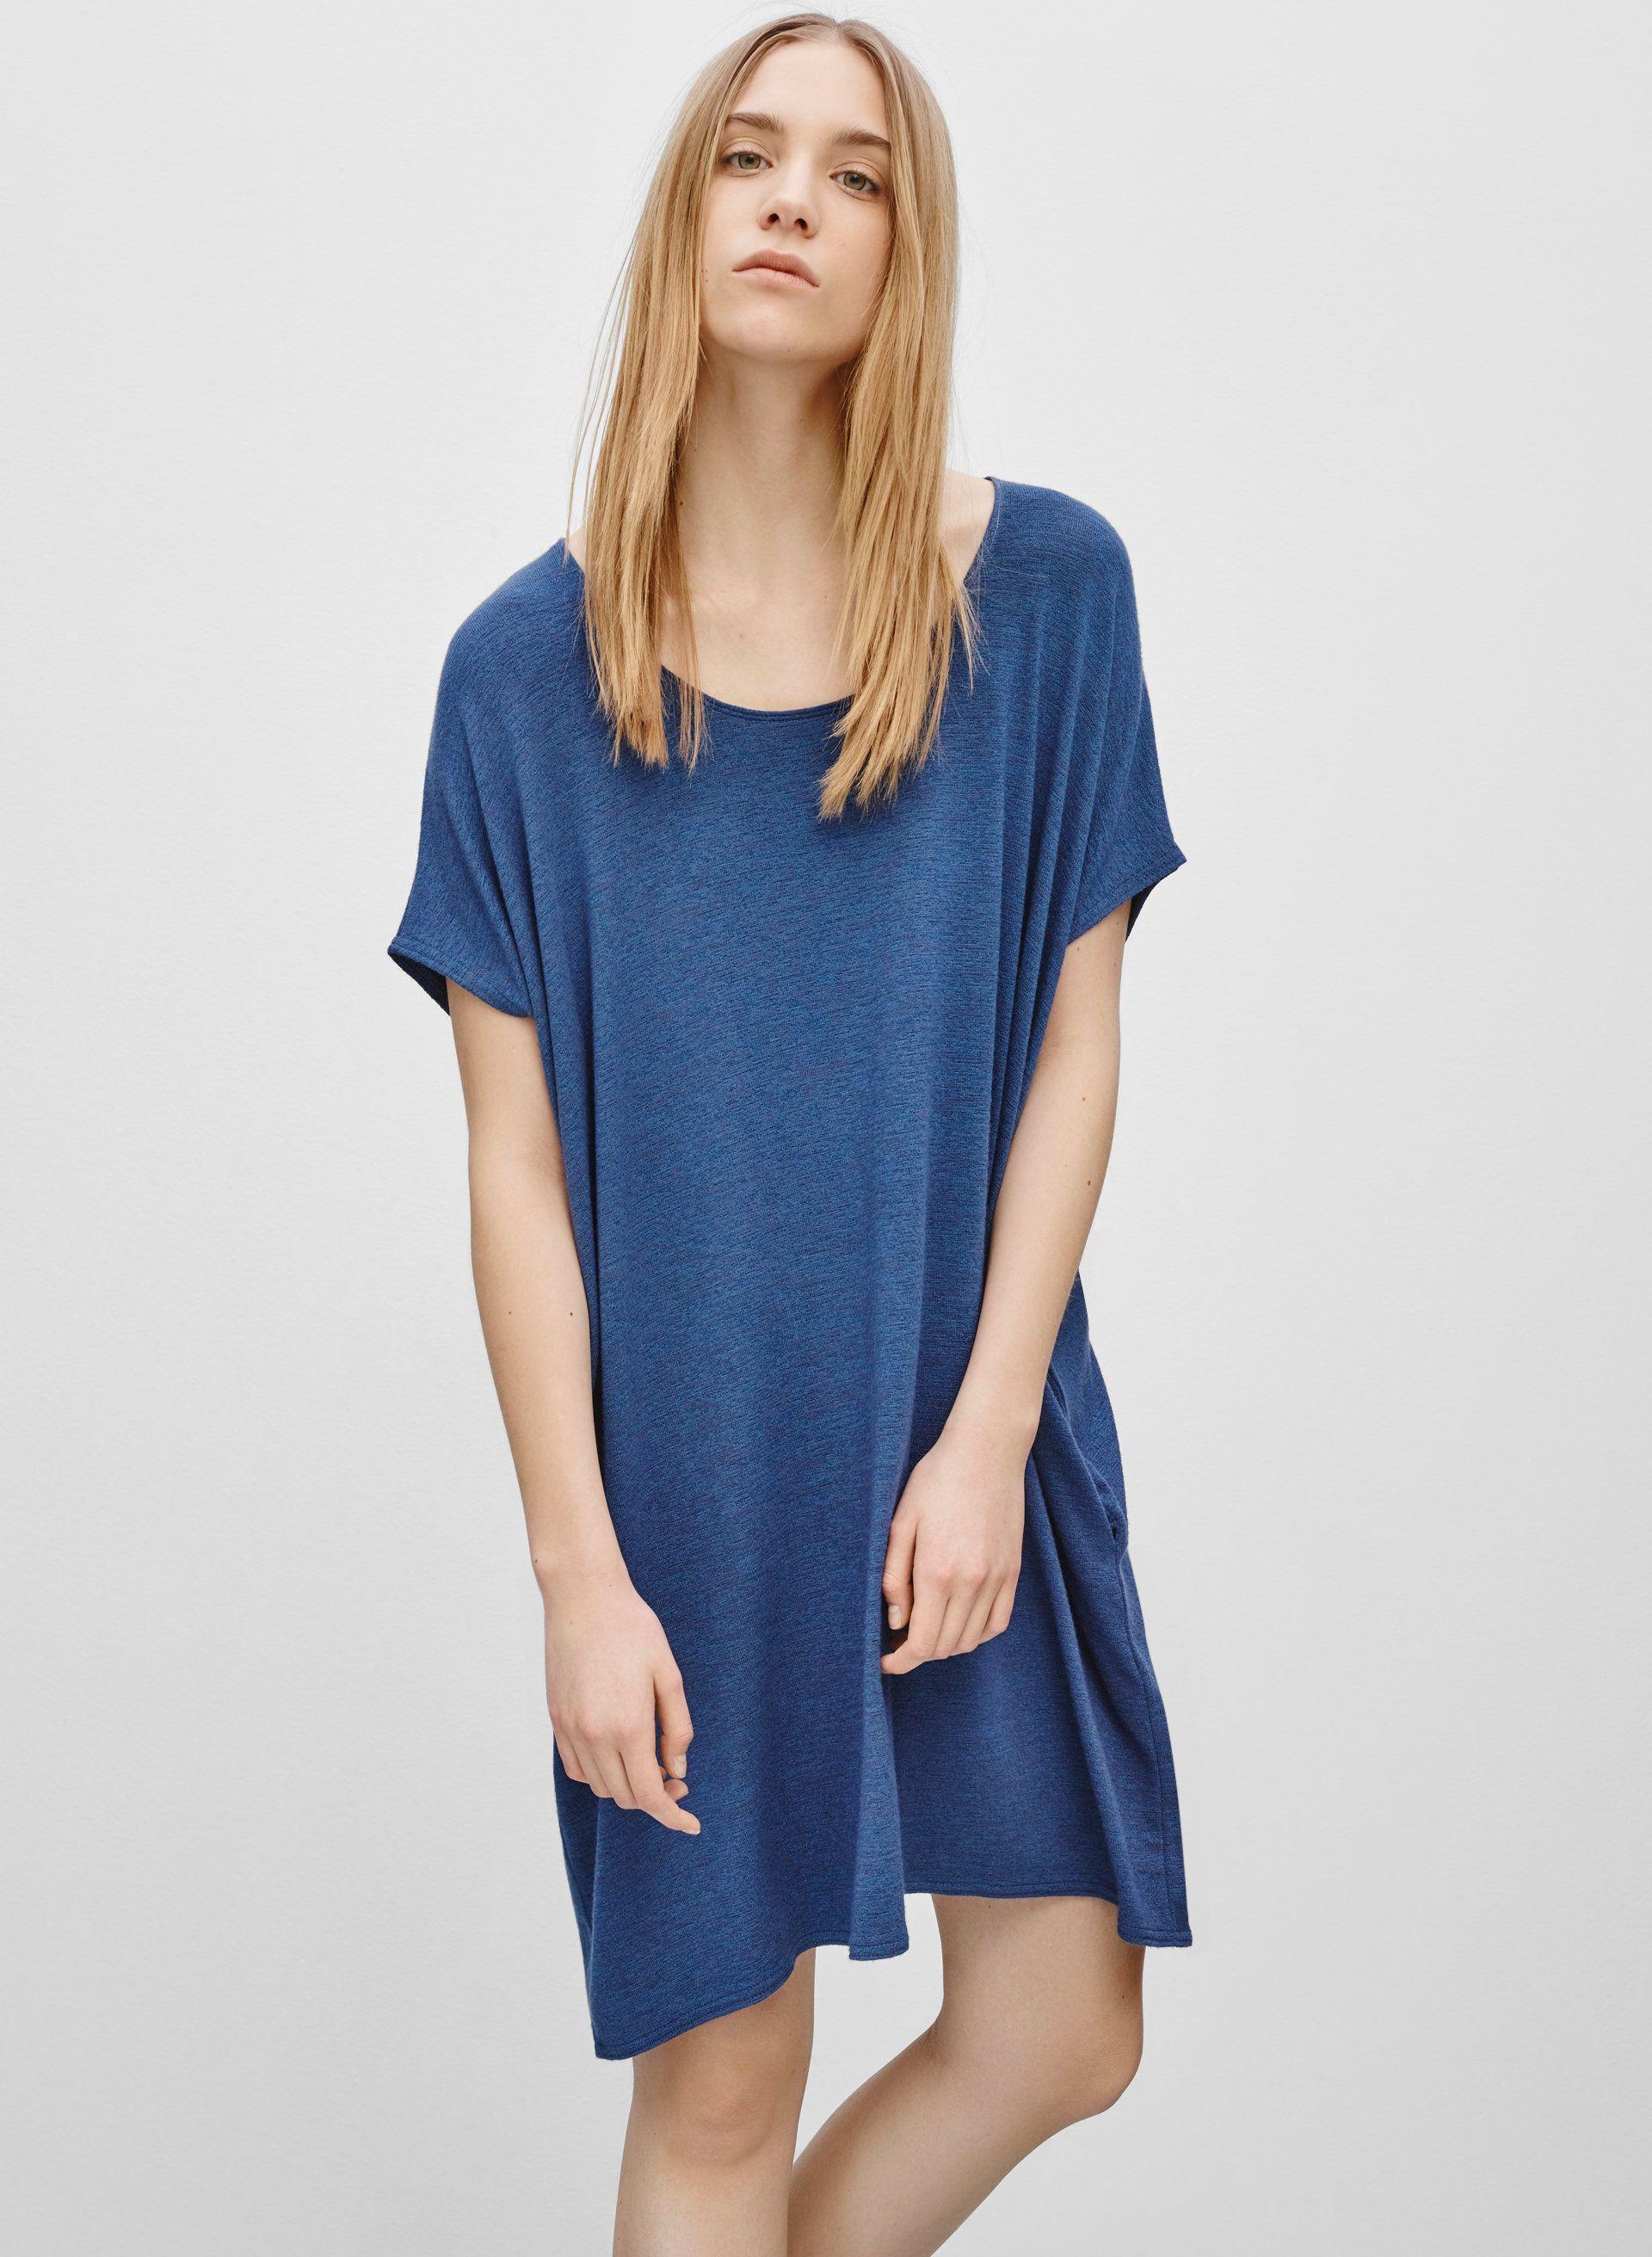 355dcfe50153 Wilfred Free LORELEI DRESS | Aritzia | Clothes! | Dresses, Shirt ...